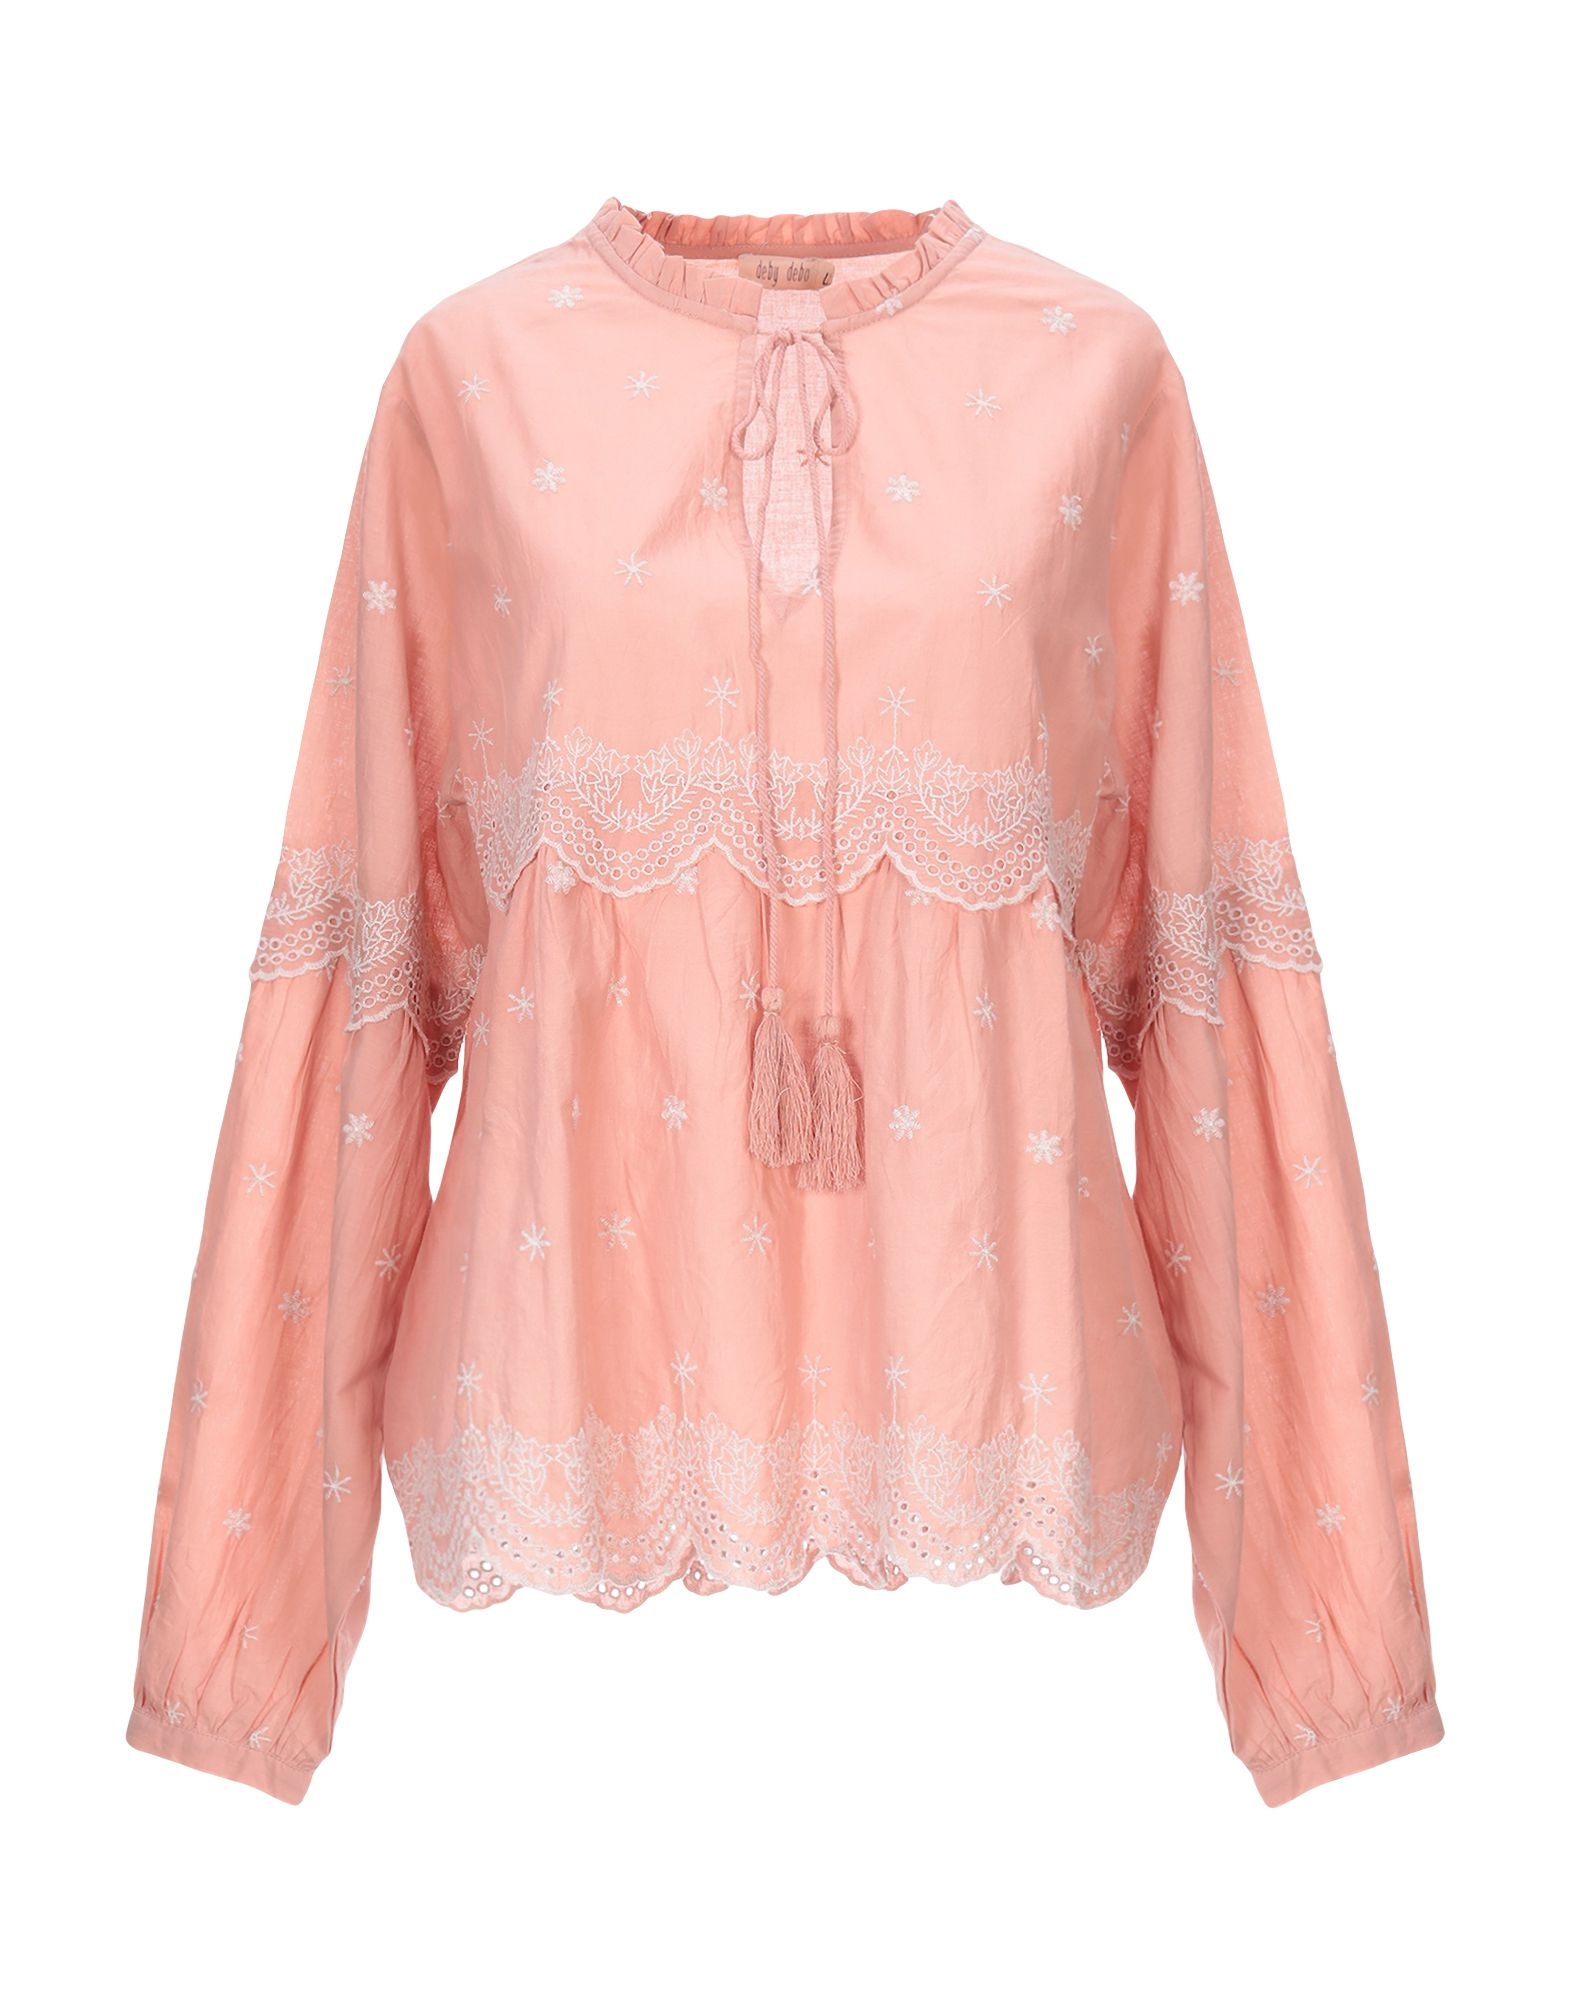 цены на DEBY DEBO Блузка  в интернет-магазинах